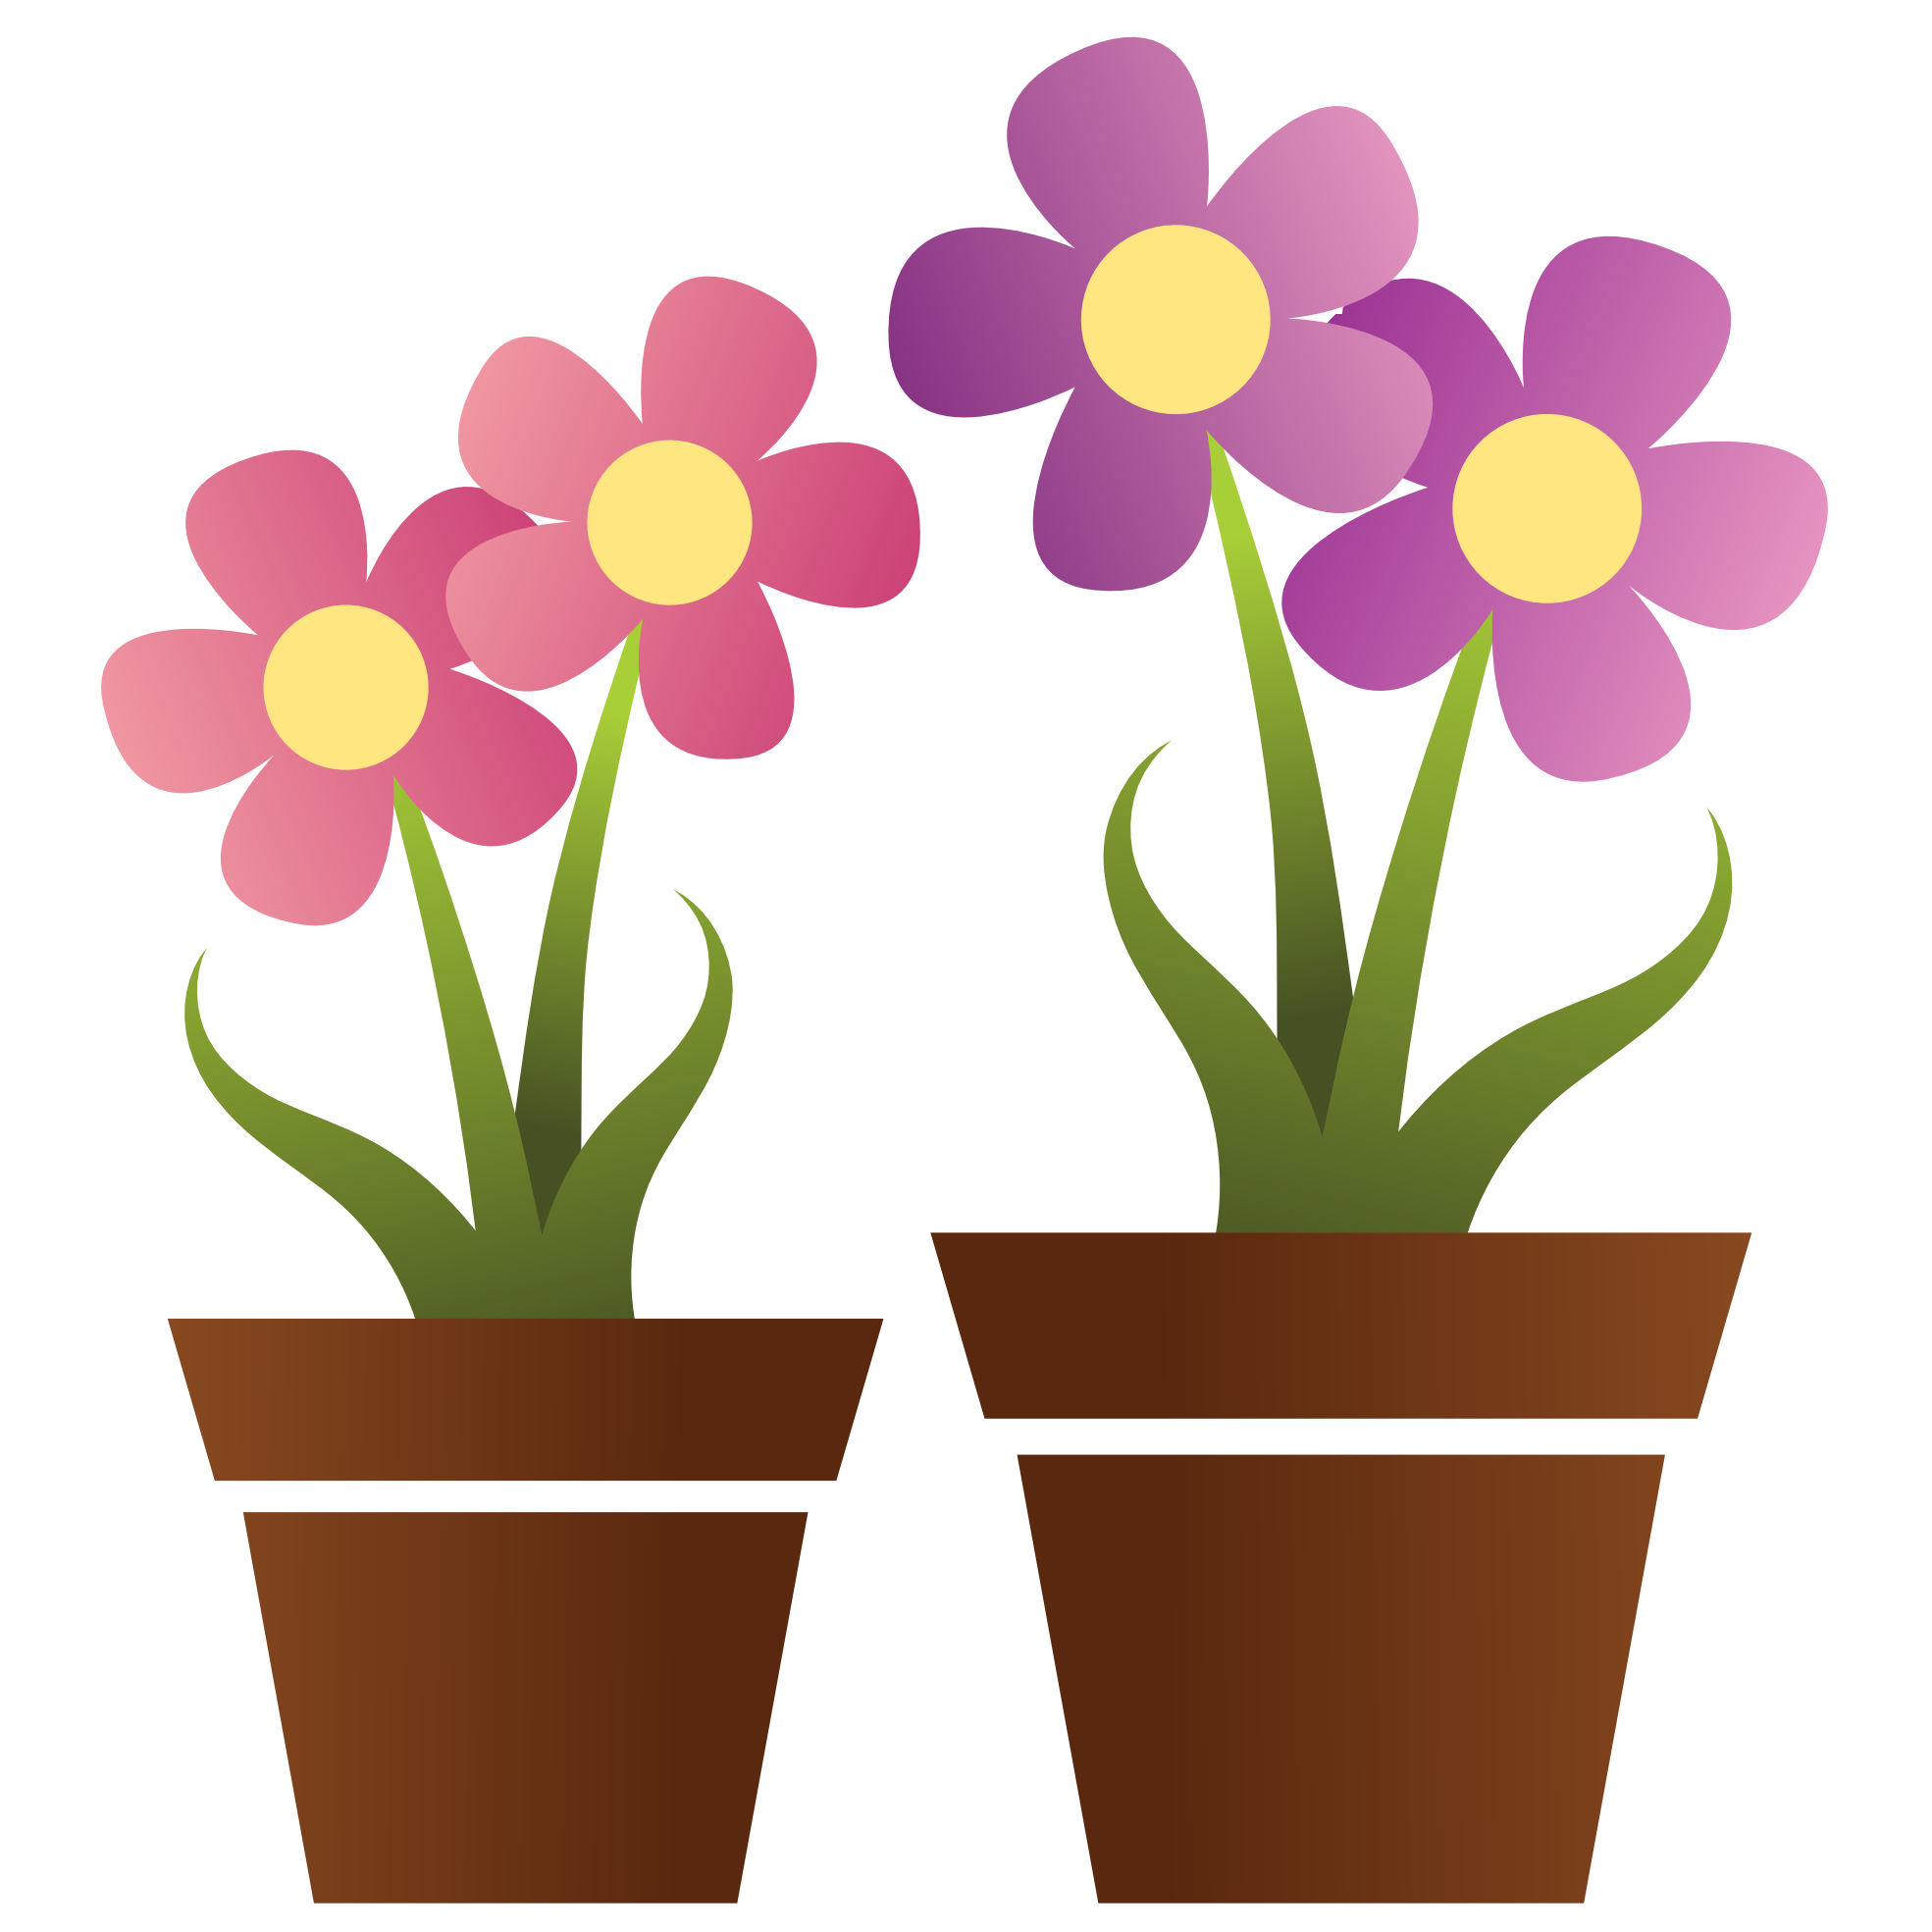 September flower clipart svg library download clipartist.net » Clip Art » Abstract Farm Flowers Scalable Vector ... svg library download